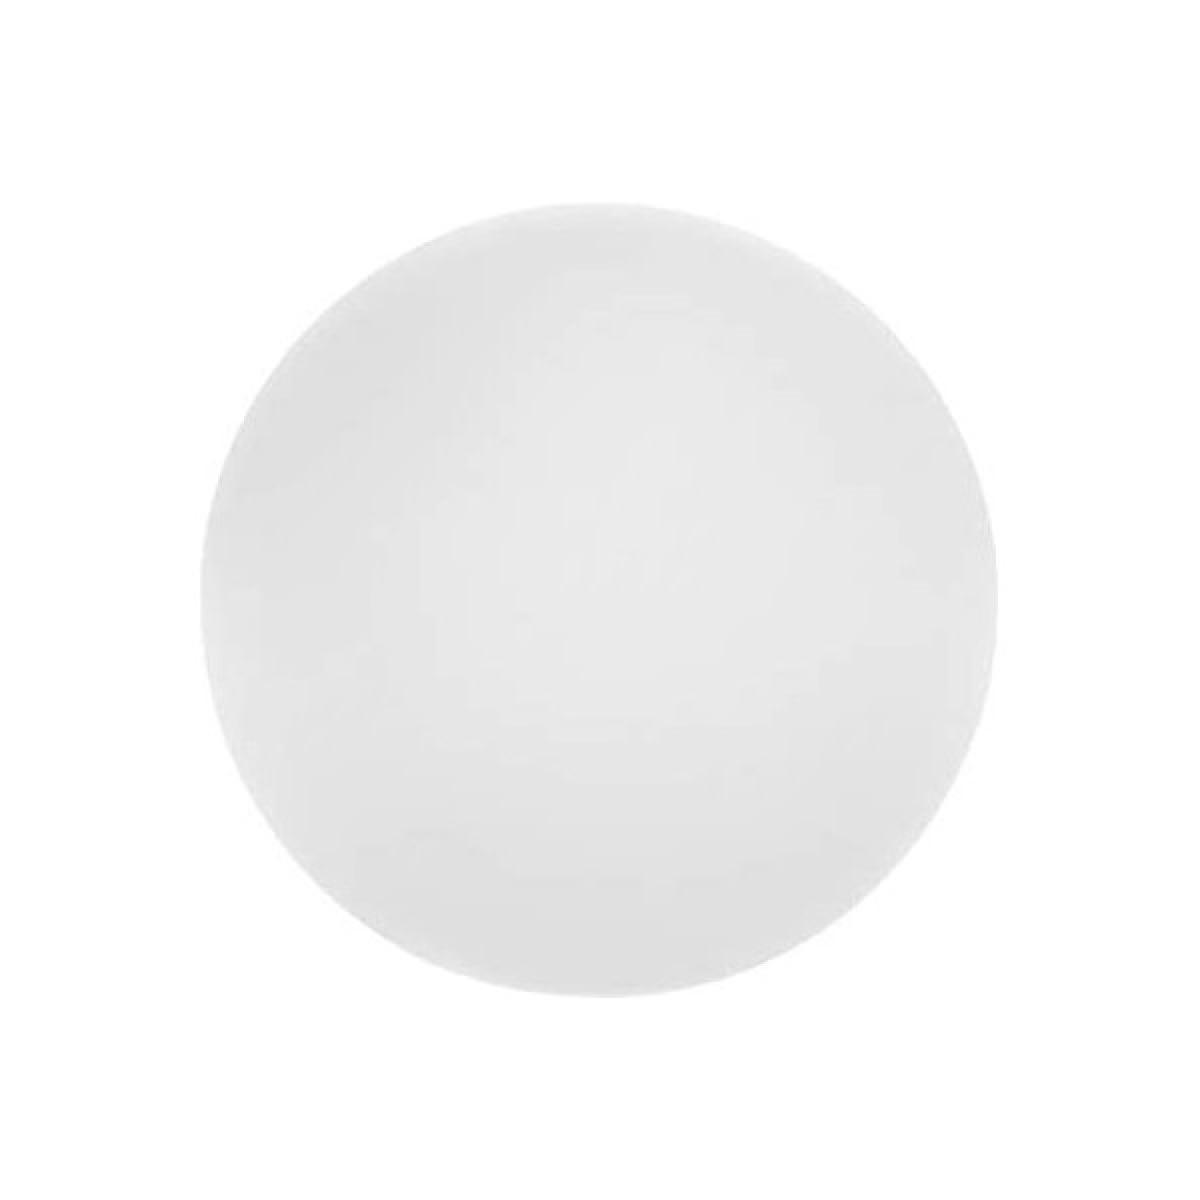 Unknown LED Ledkia A++ 1 W (Blanc froid 3800K - 4200K)